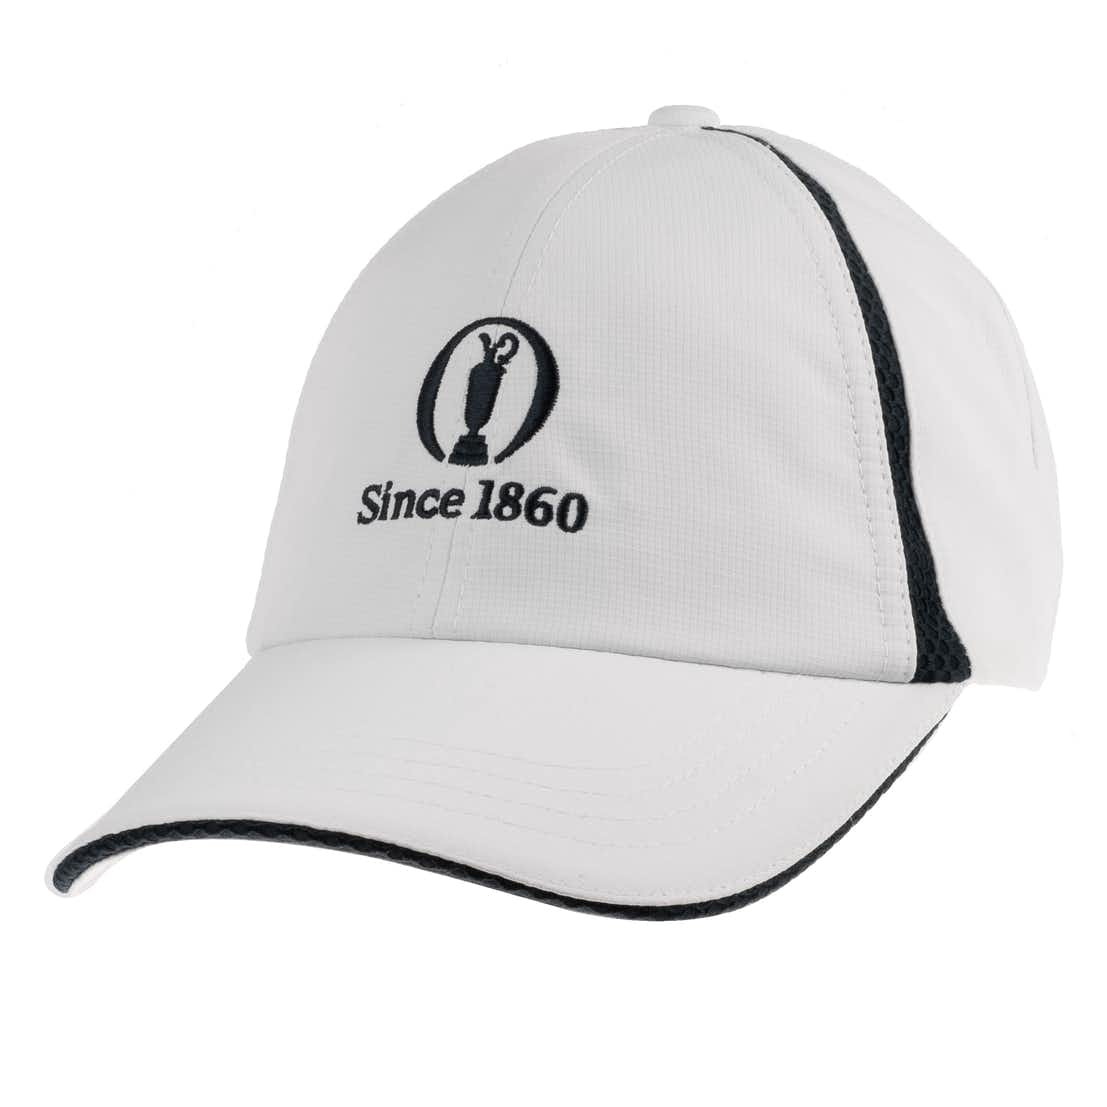 Heritage Since 1860 Baseball Cap - White